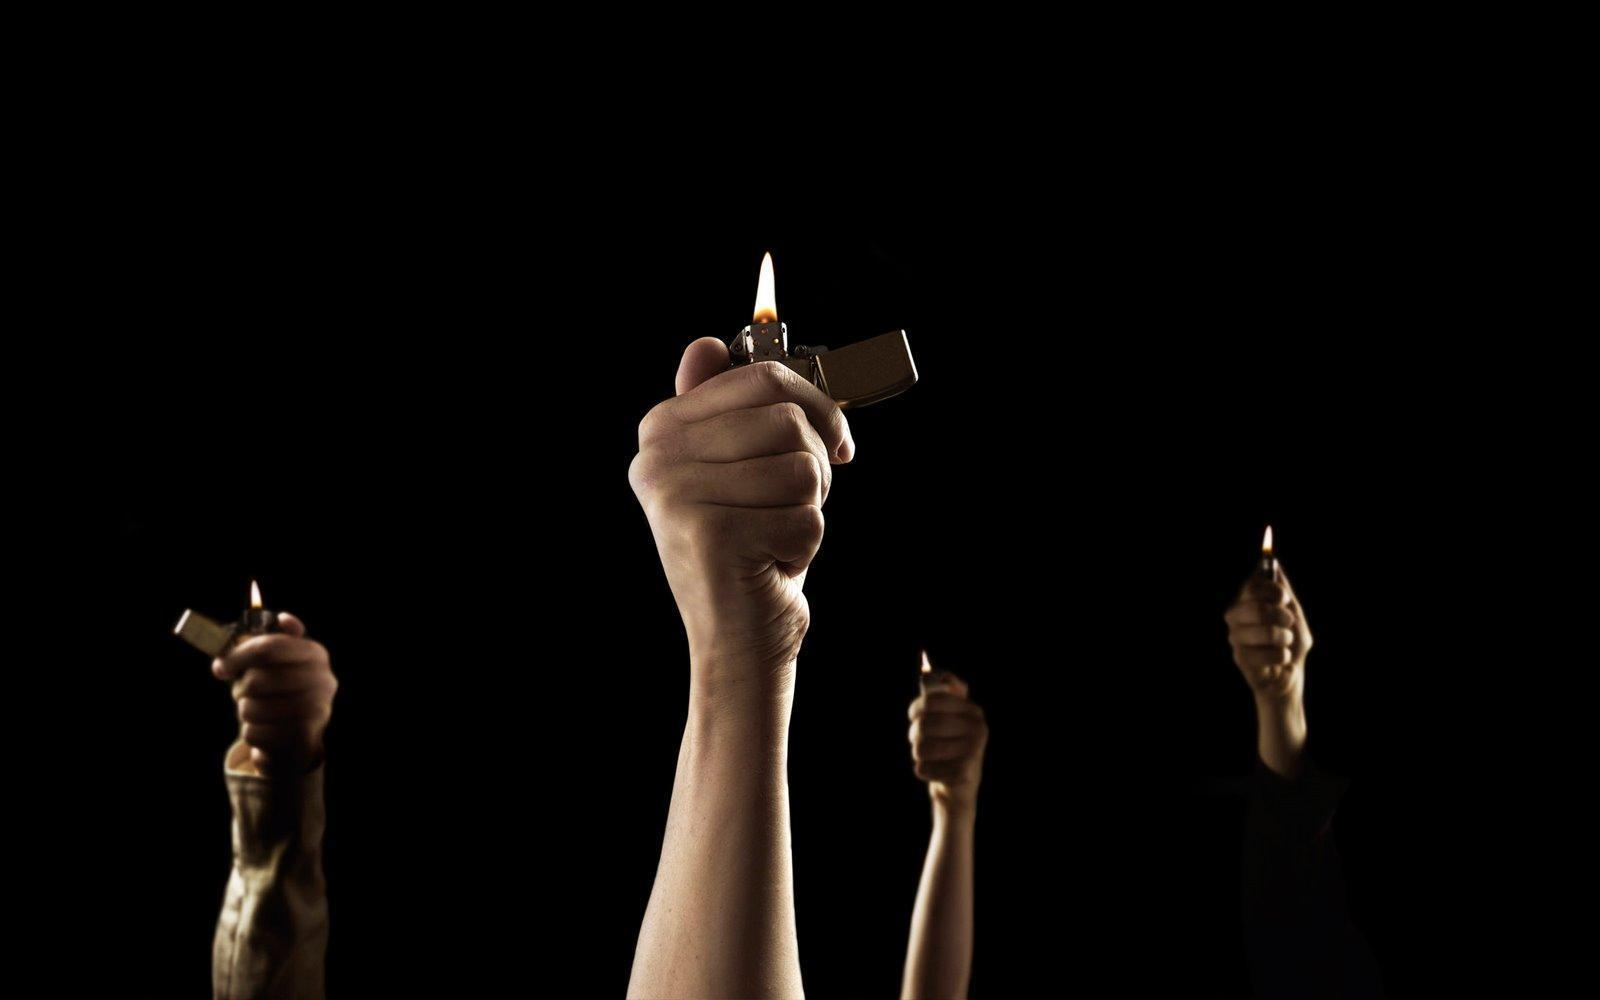 lighters-in-the-darkness.jpg